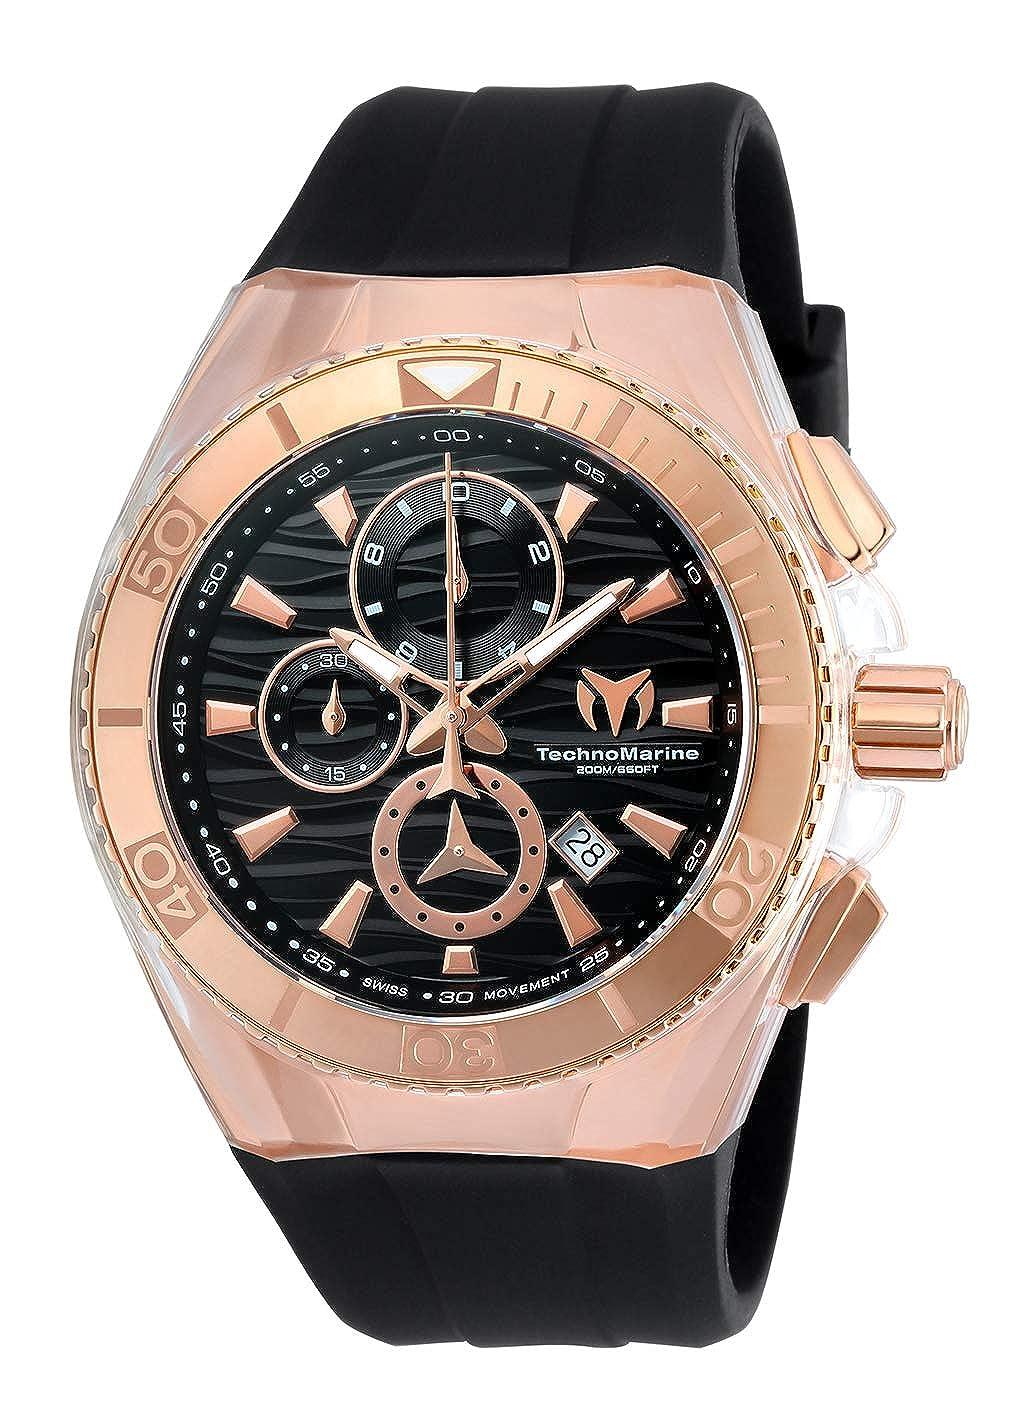 Technomarine Men s Cruise Star Stainless Steel Quartz Watch with Silicone Strap, Black, 29 Model TM-115048